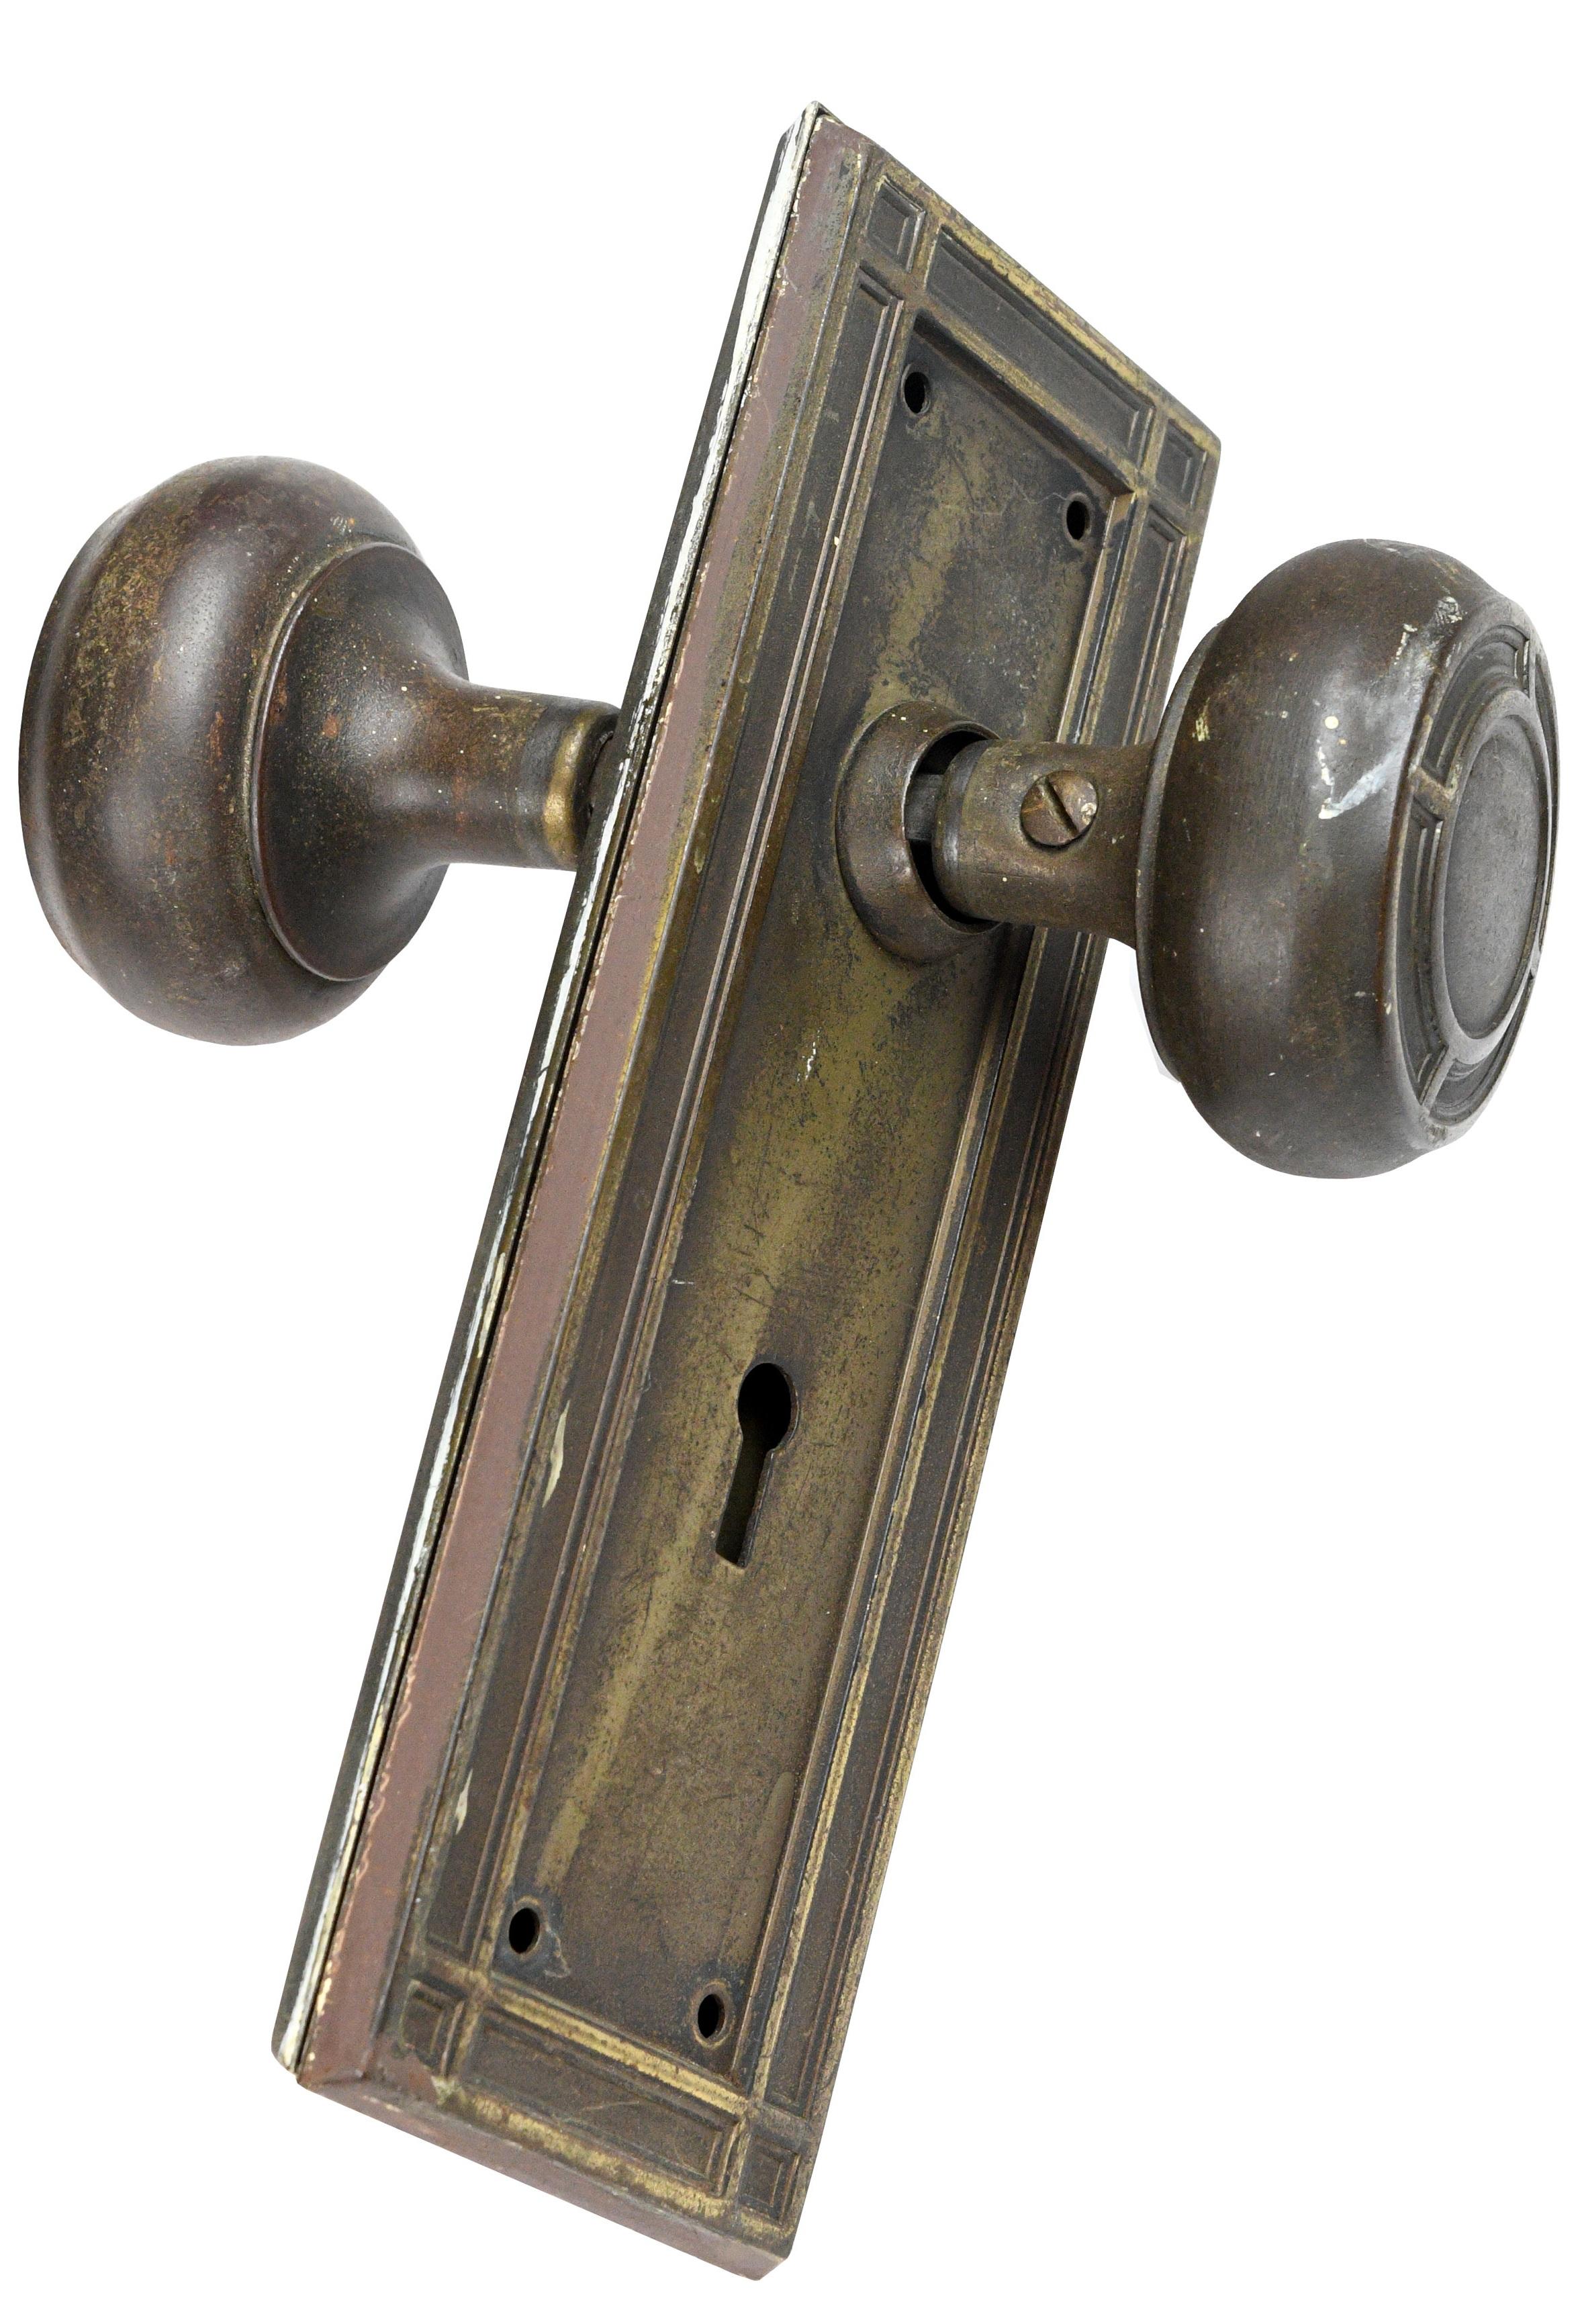 H20180-iron-knob-set-full-view.jpg